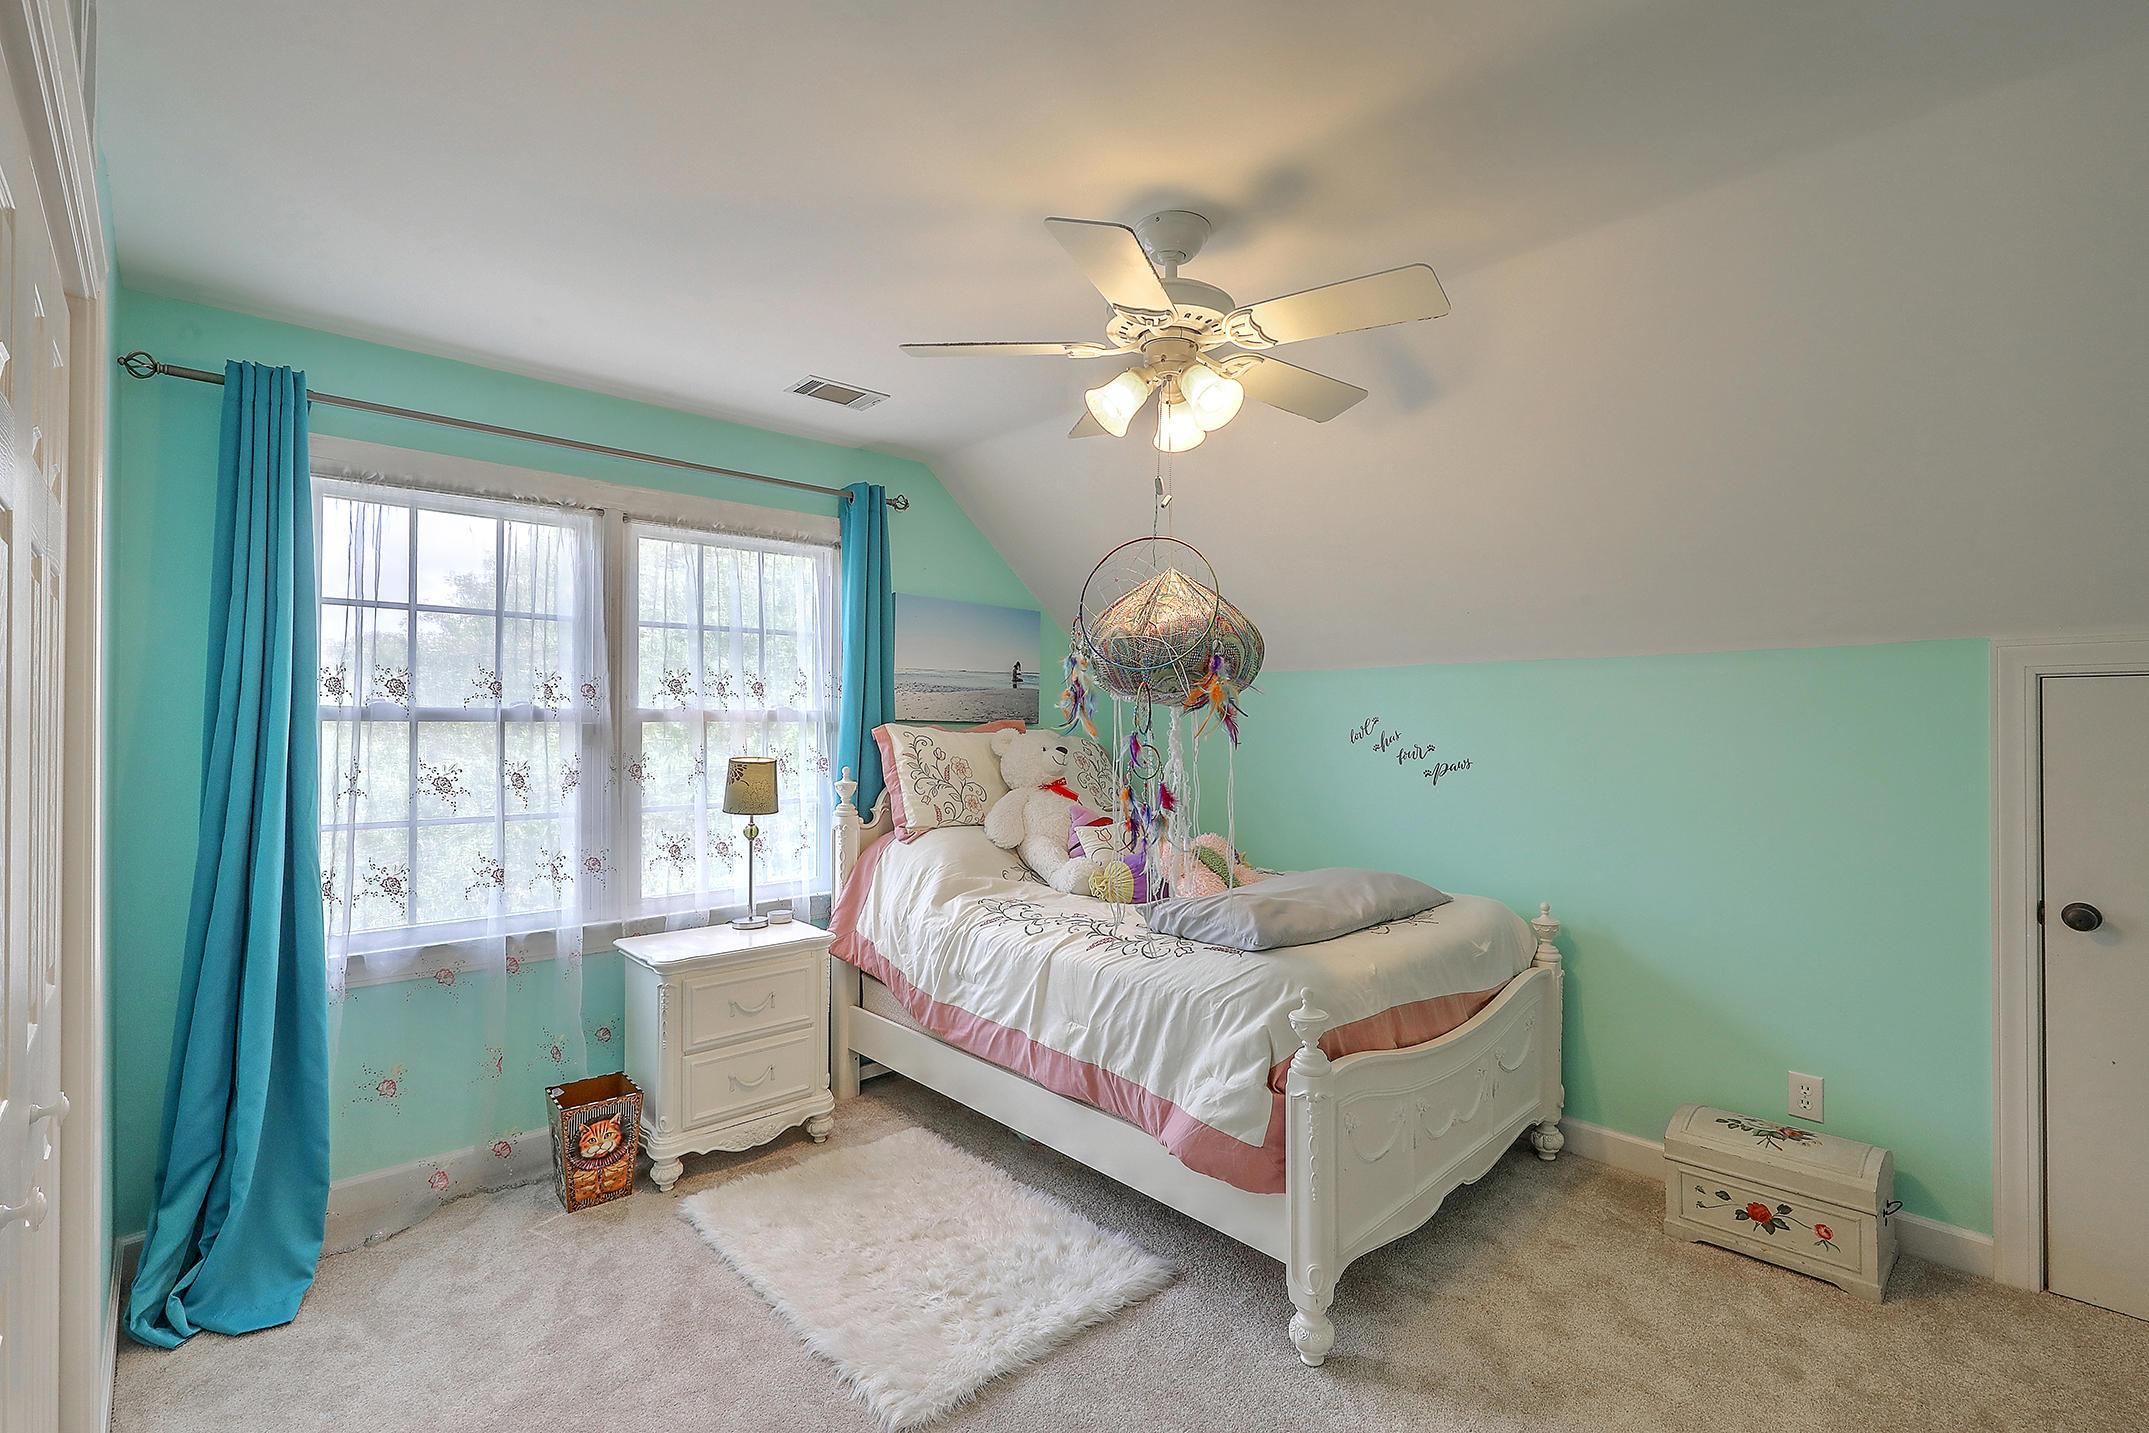 Stono Pointe Homes For Sale - 2660 Burden Creek, Johns Island, SC - 33